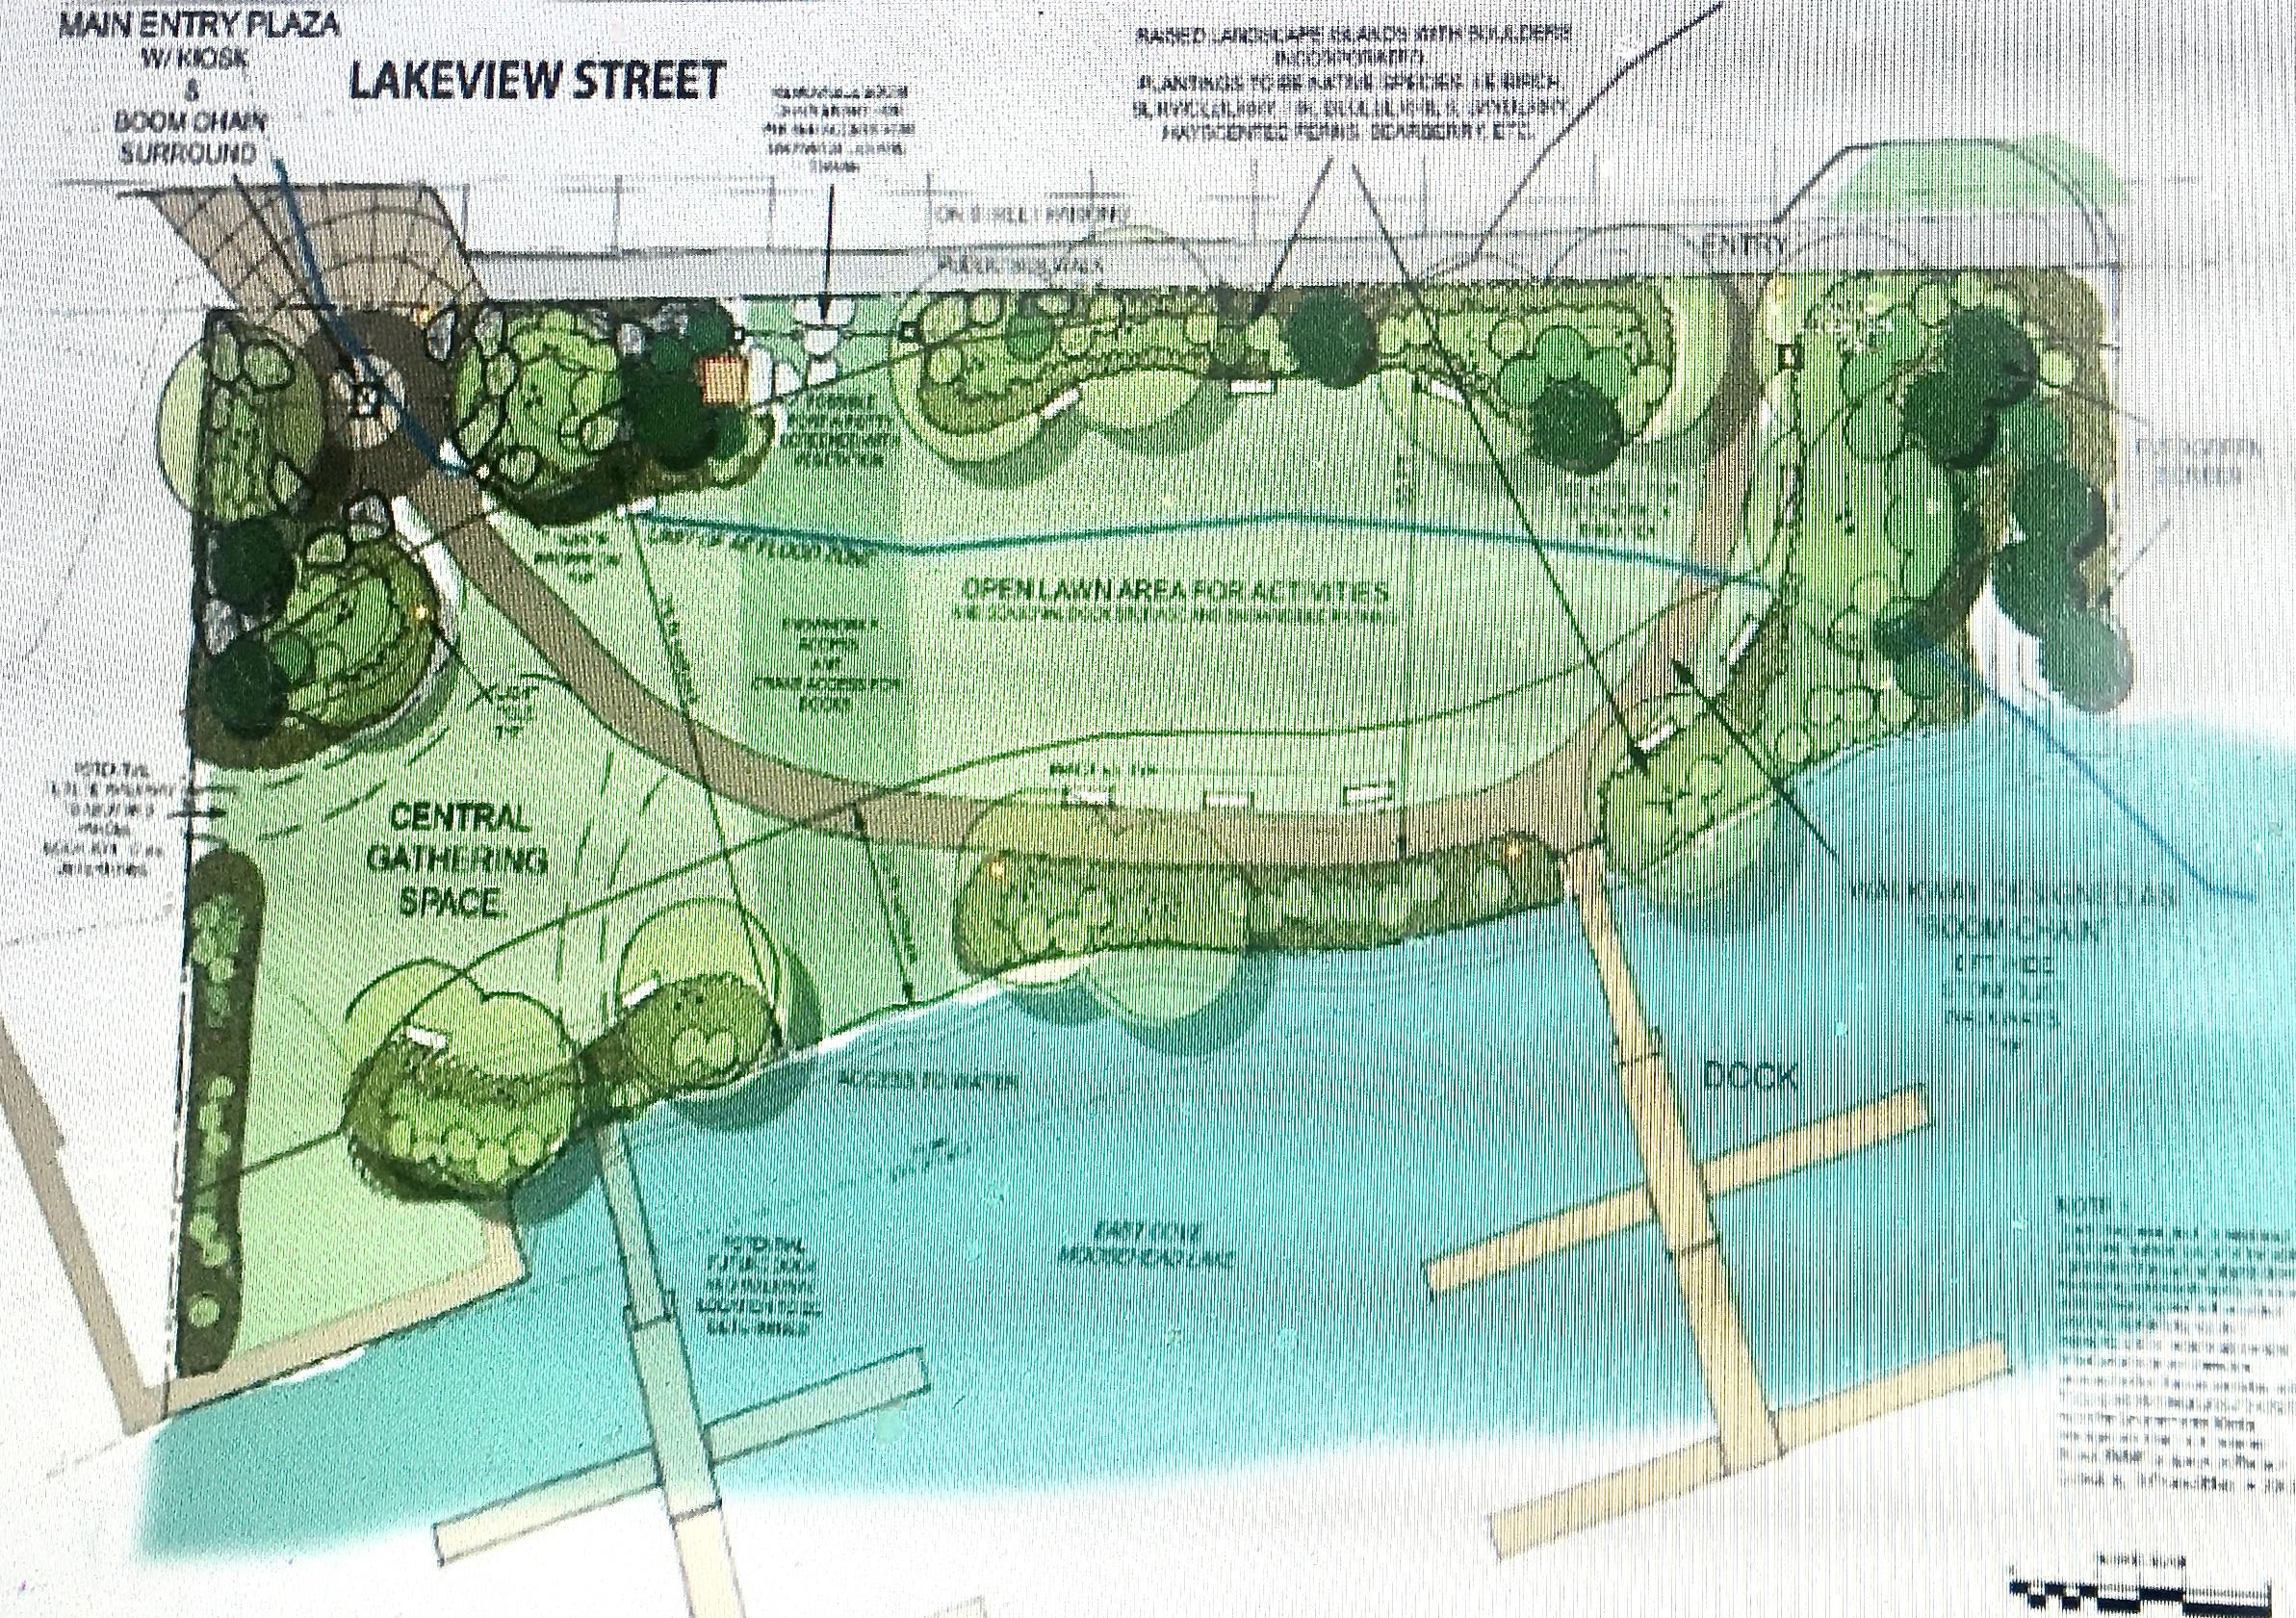 Drawing of Crafts Landing Park